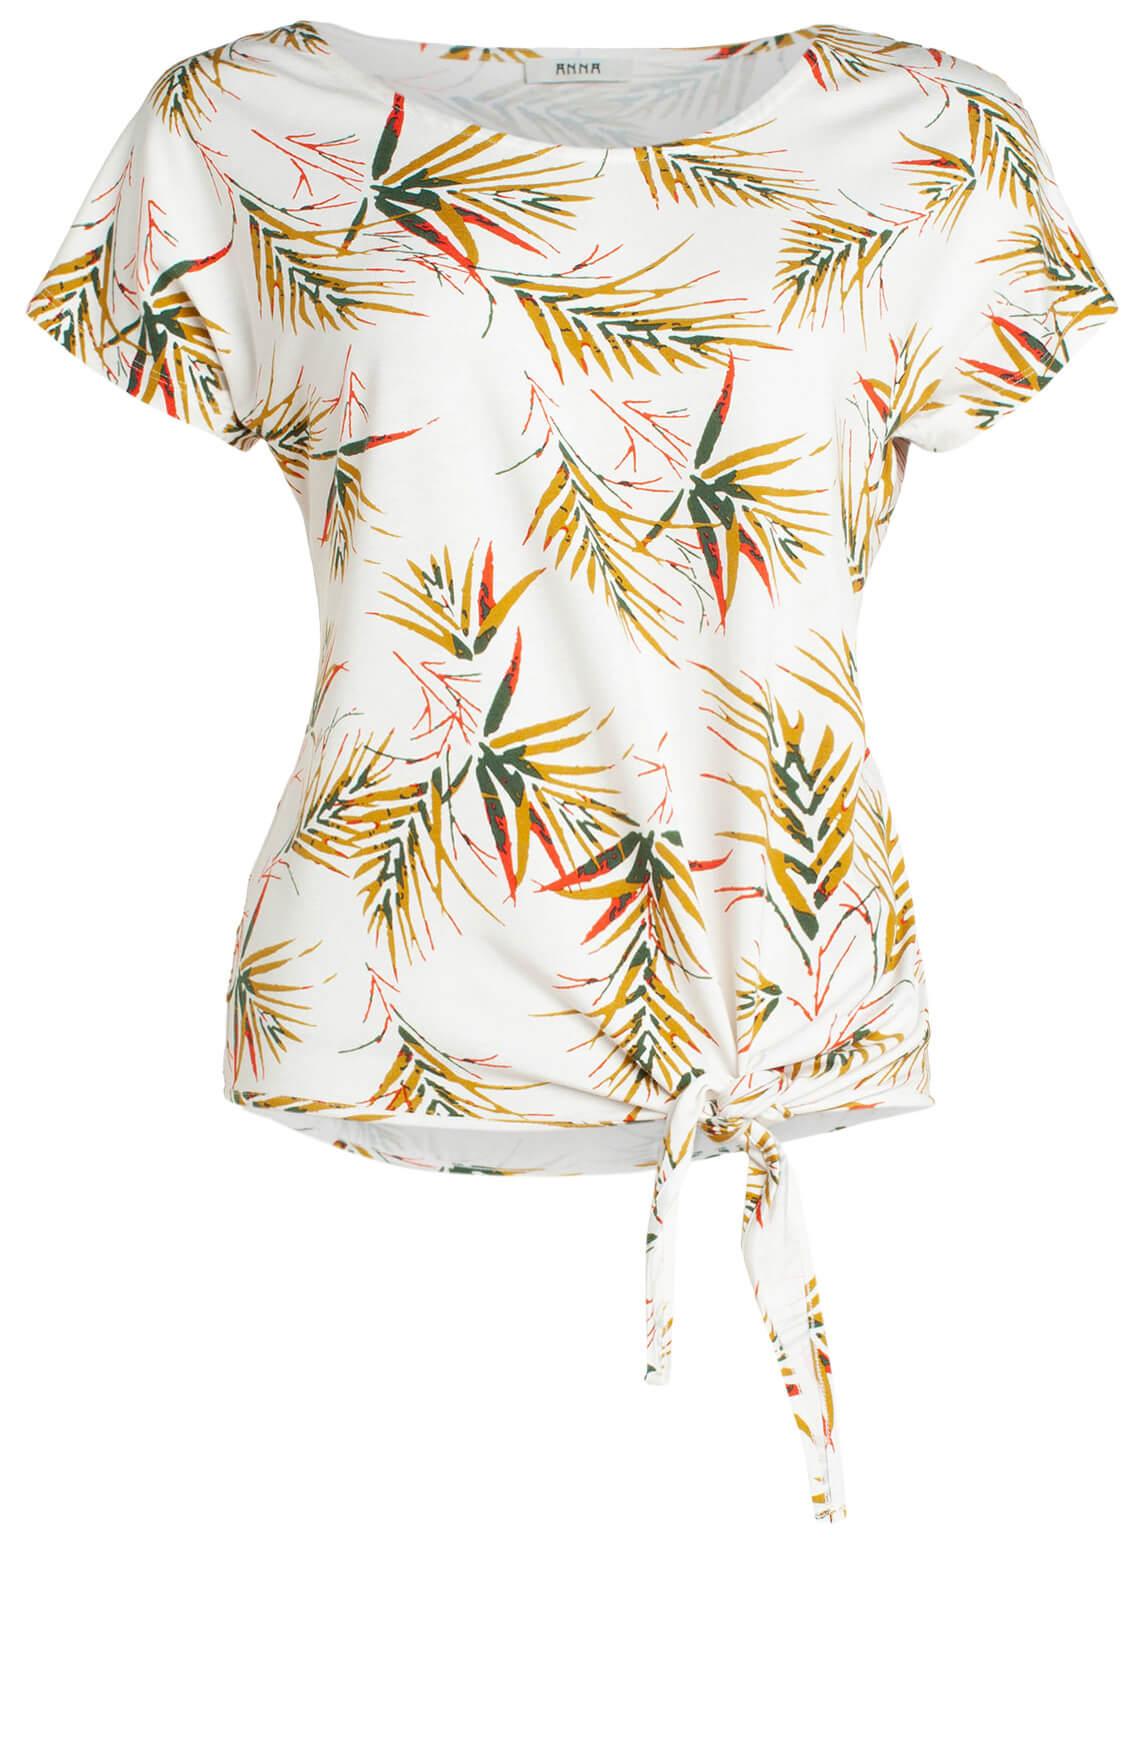 Anna Dames Shirt met tropische print wit